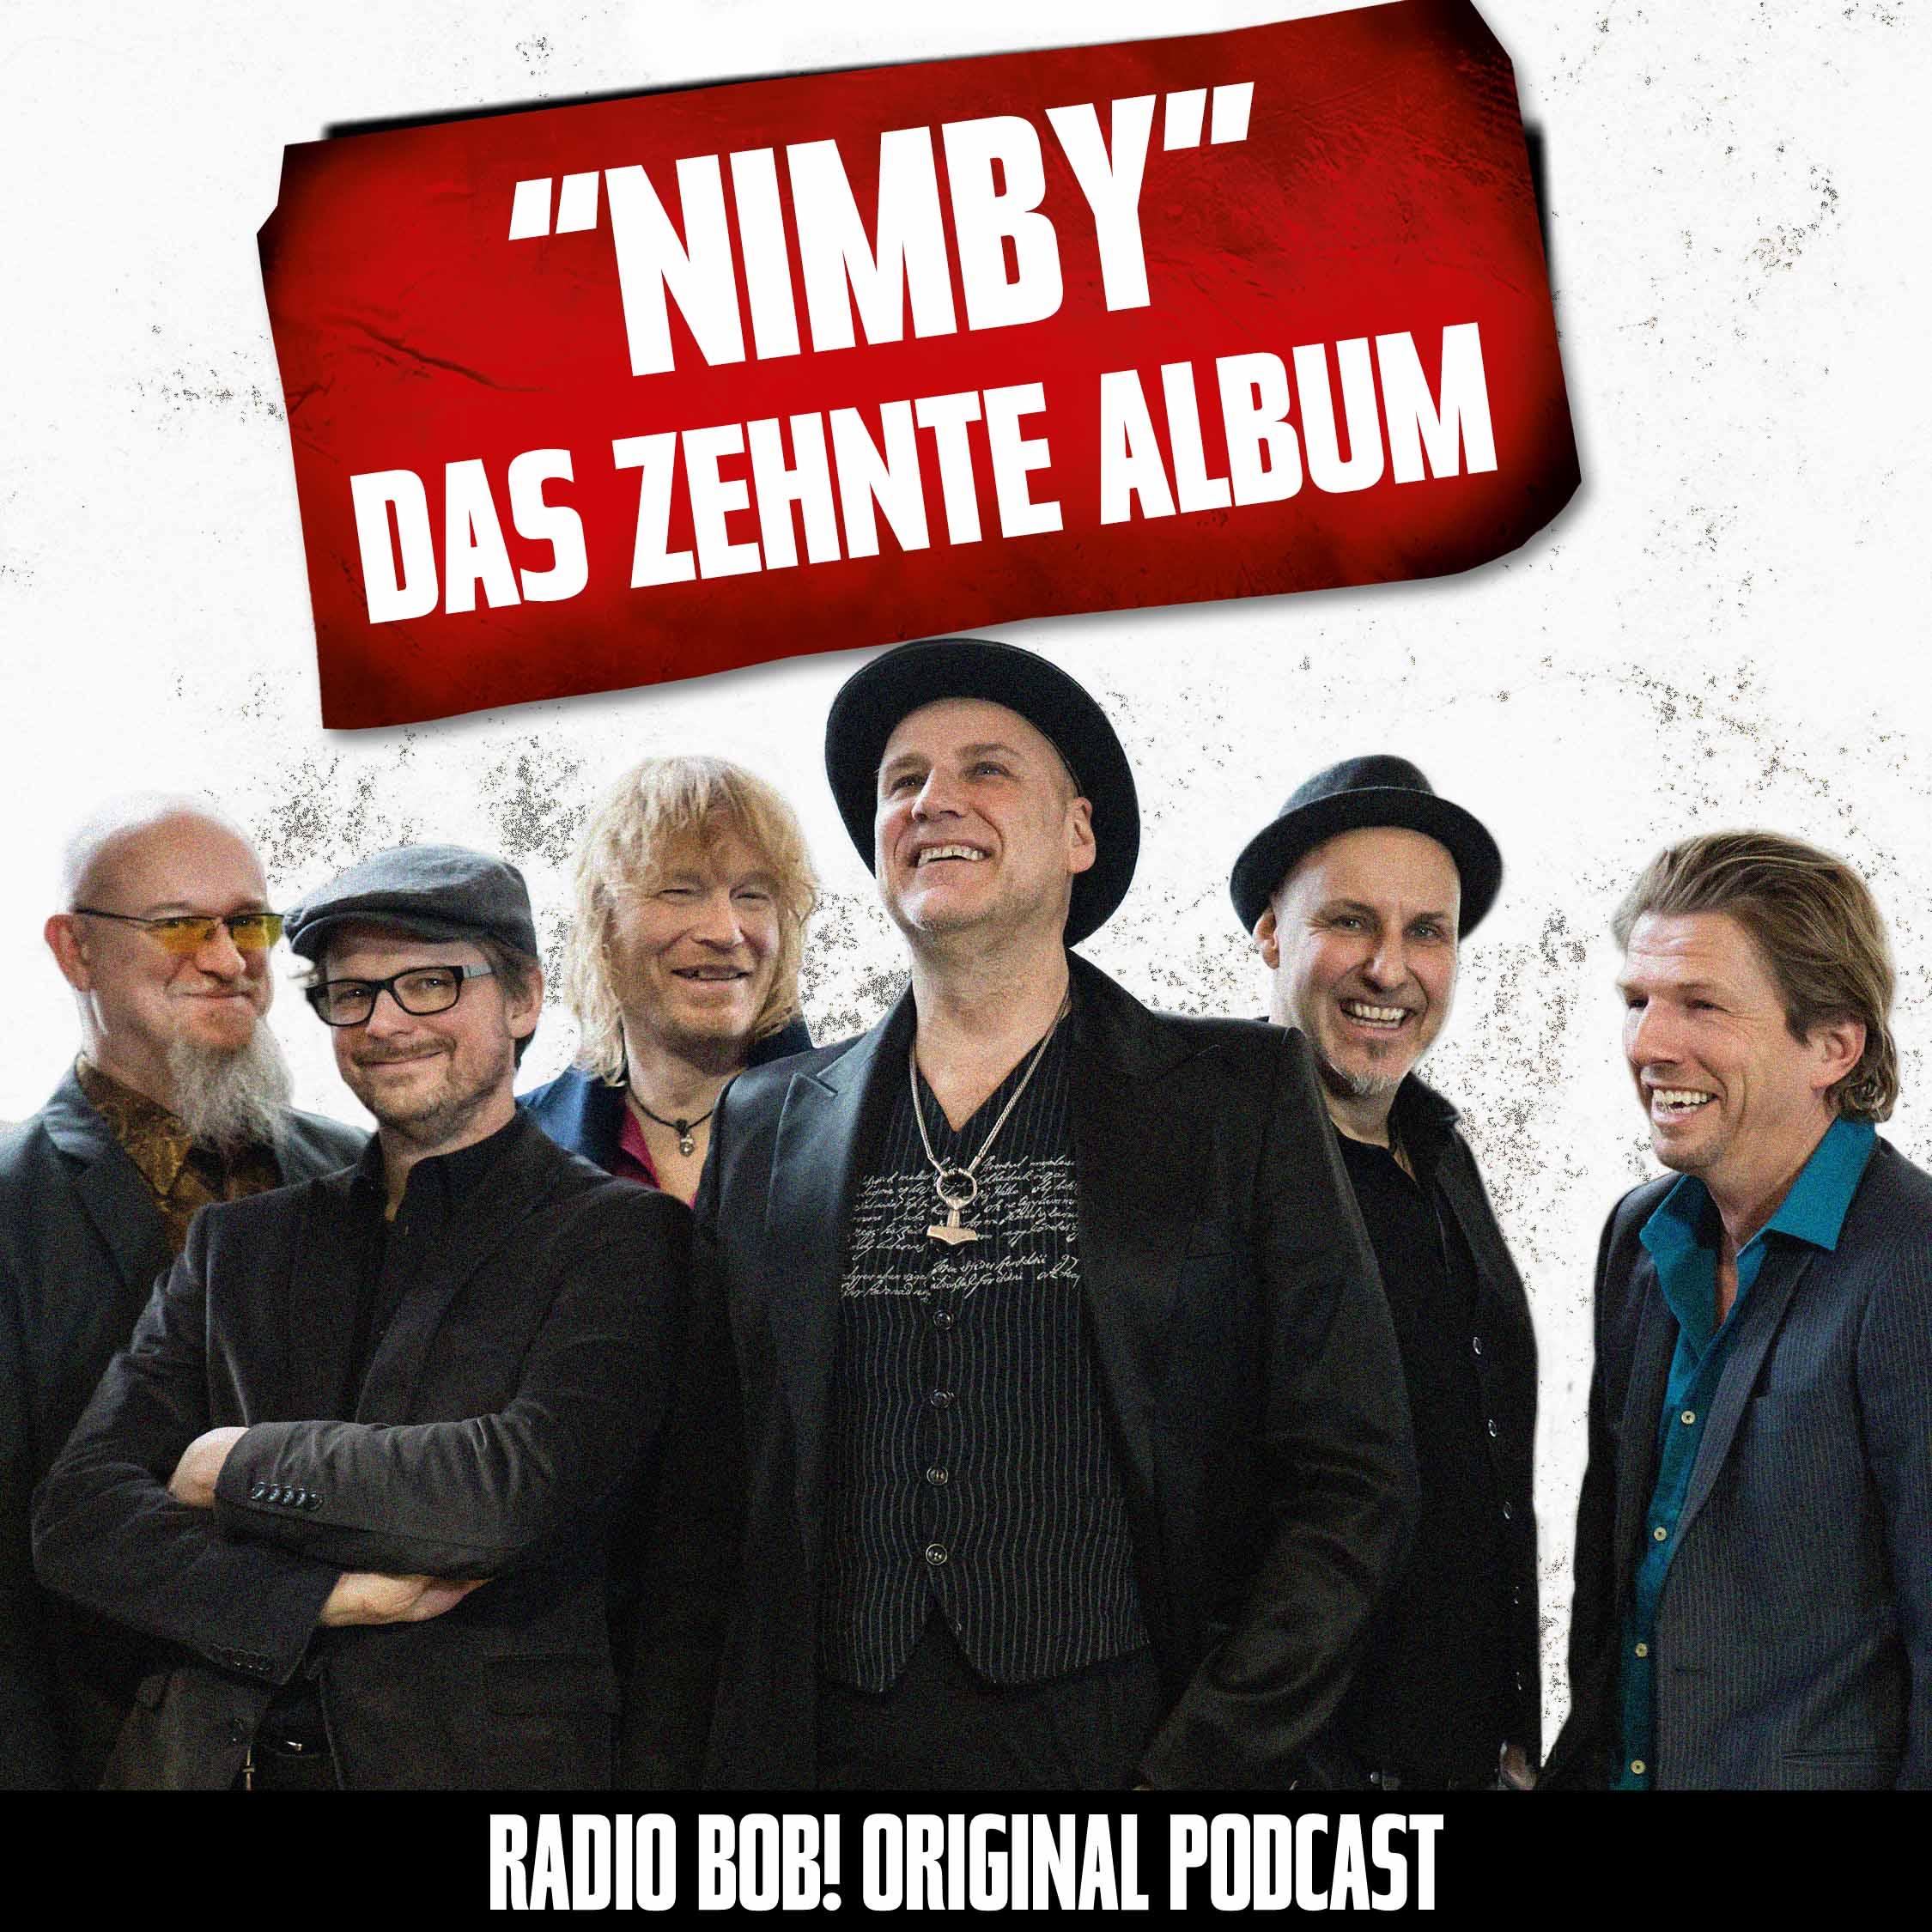 #11 - das zehnte Album: Nimby